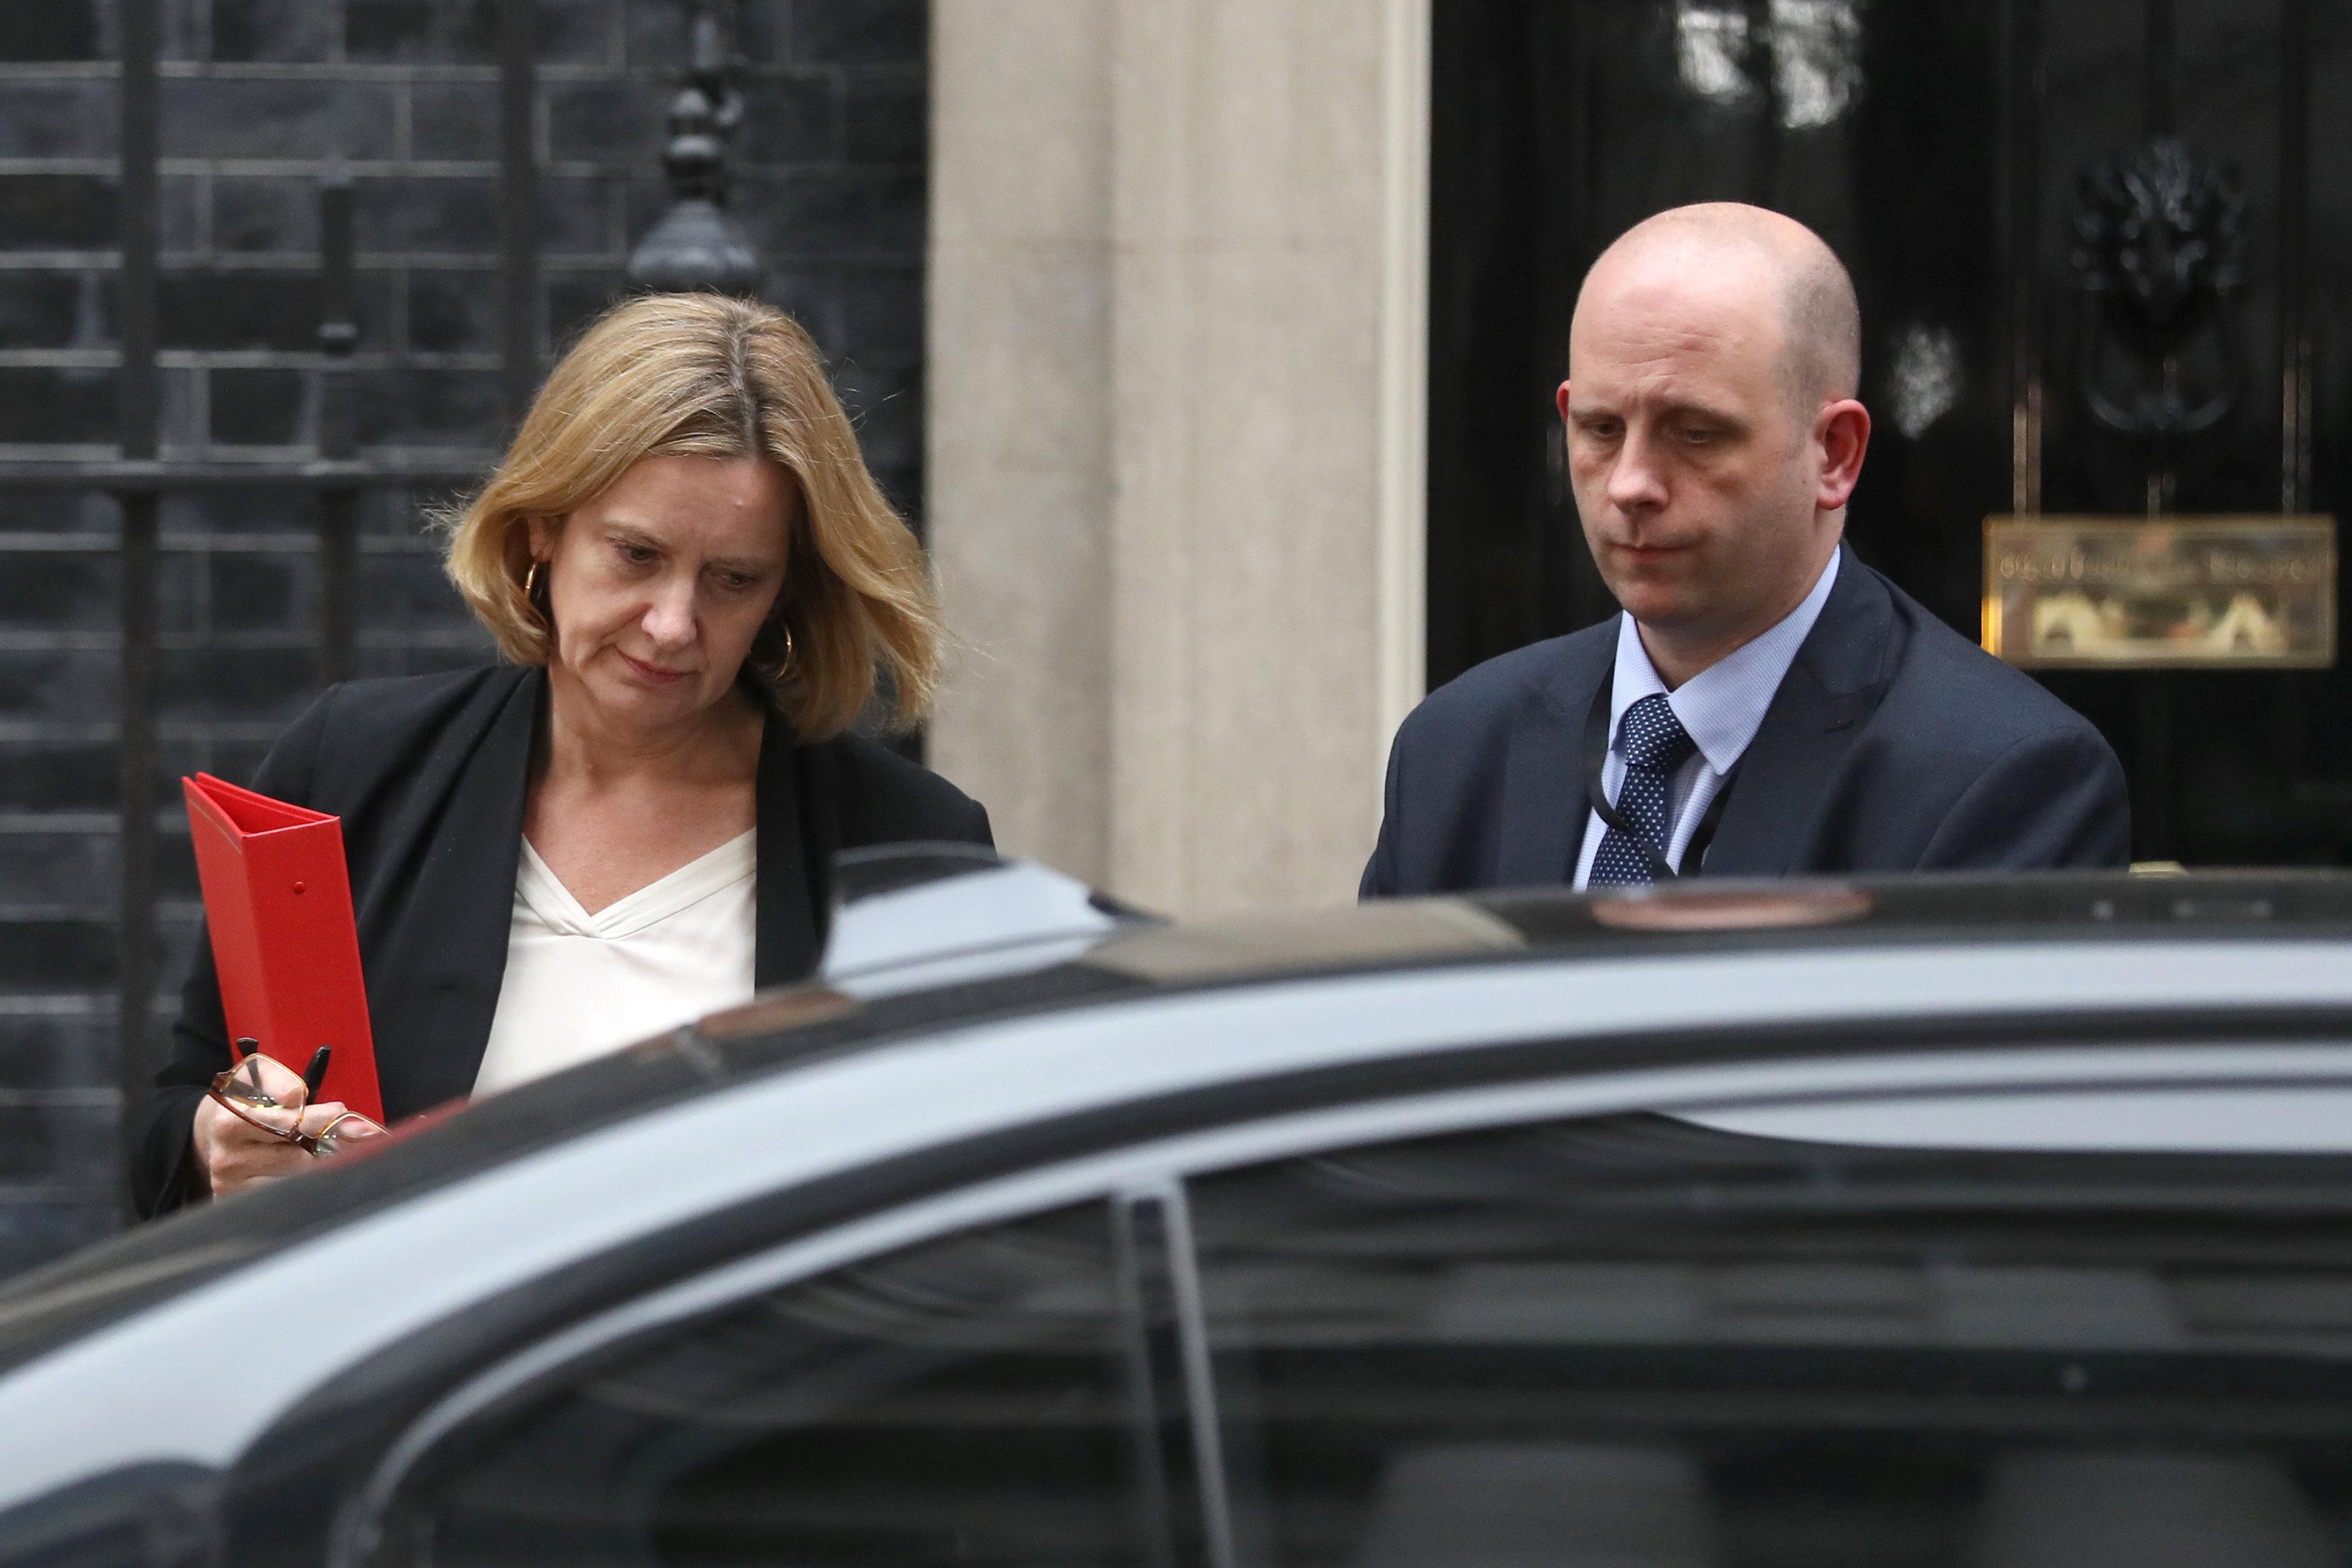 Britain's Home Secretary Amber Rudd leaves 10 Downing Street in London, Britain, April 12, 2018. REUTERS/Simon Dawson